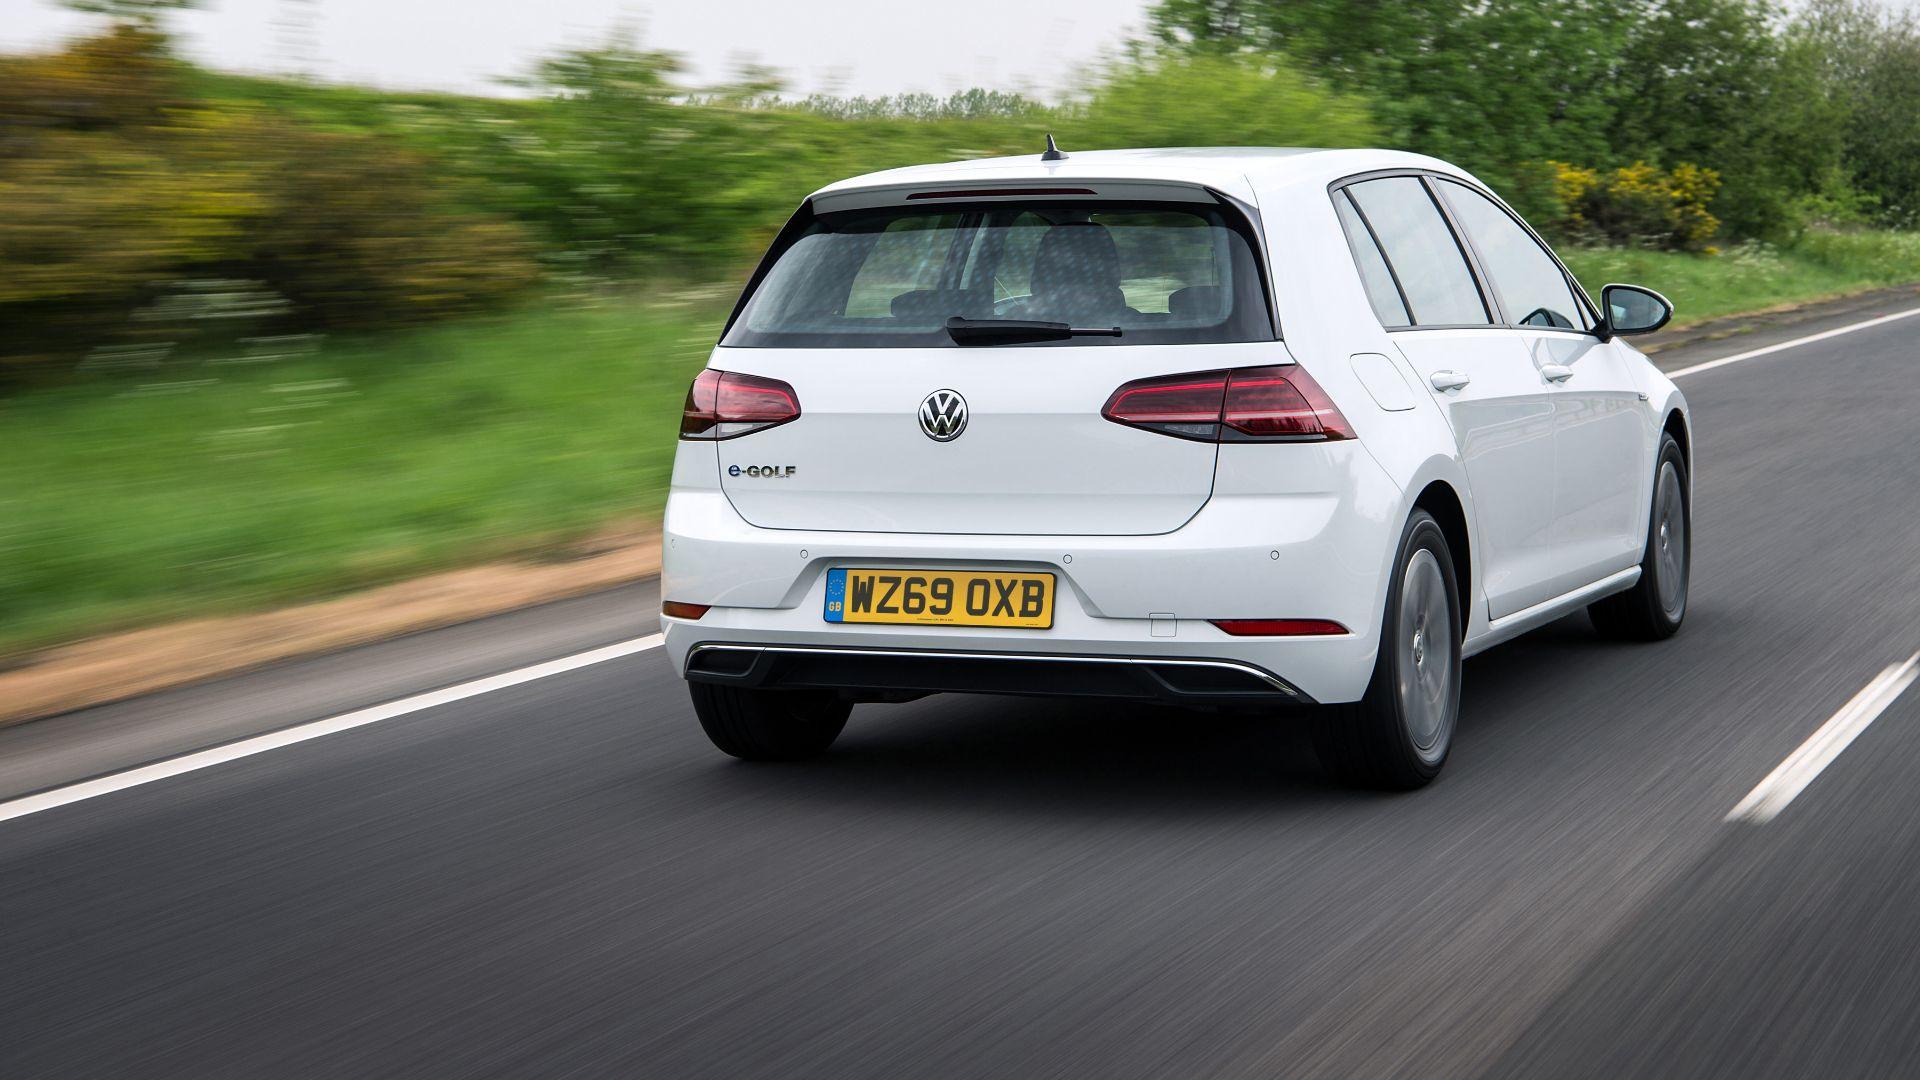 Volkswagen T-Cross (2020) Specs & Price - Cars.co.za | 1080x1920